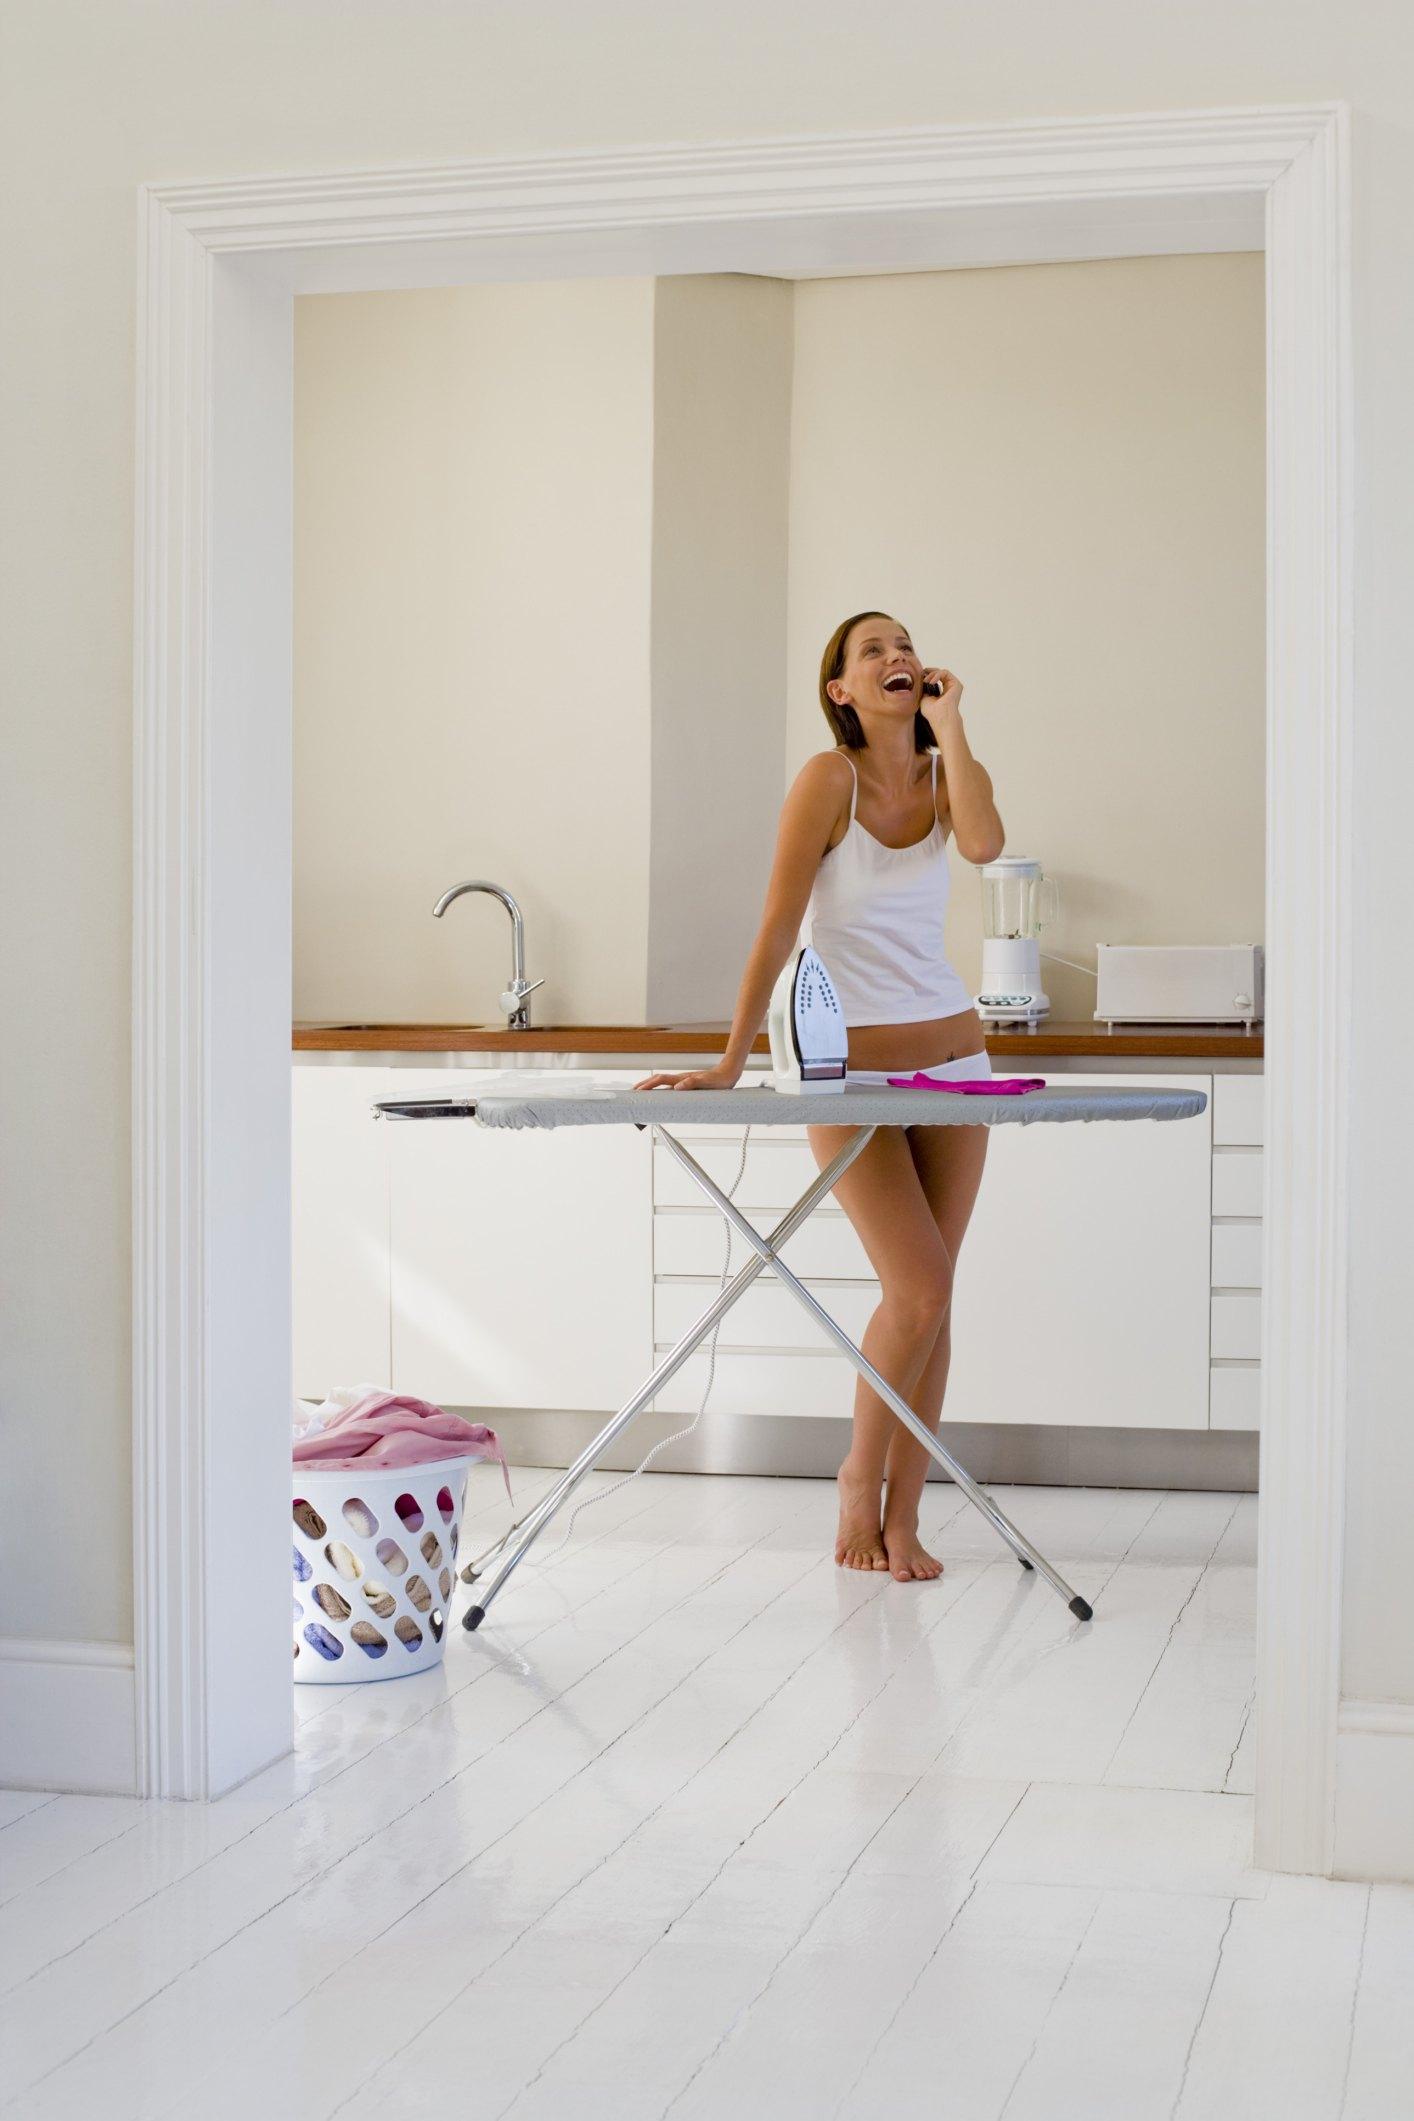 How To Make A Creepy Basement Laundry Room Feel Nicer Ehow